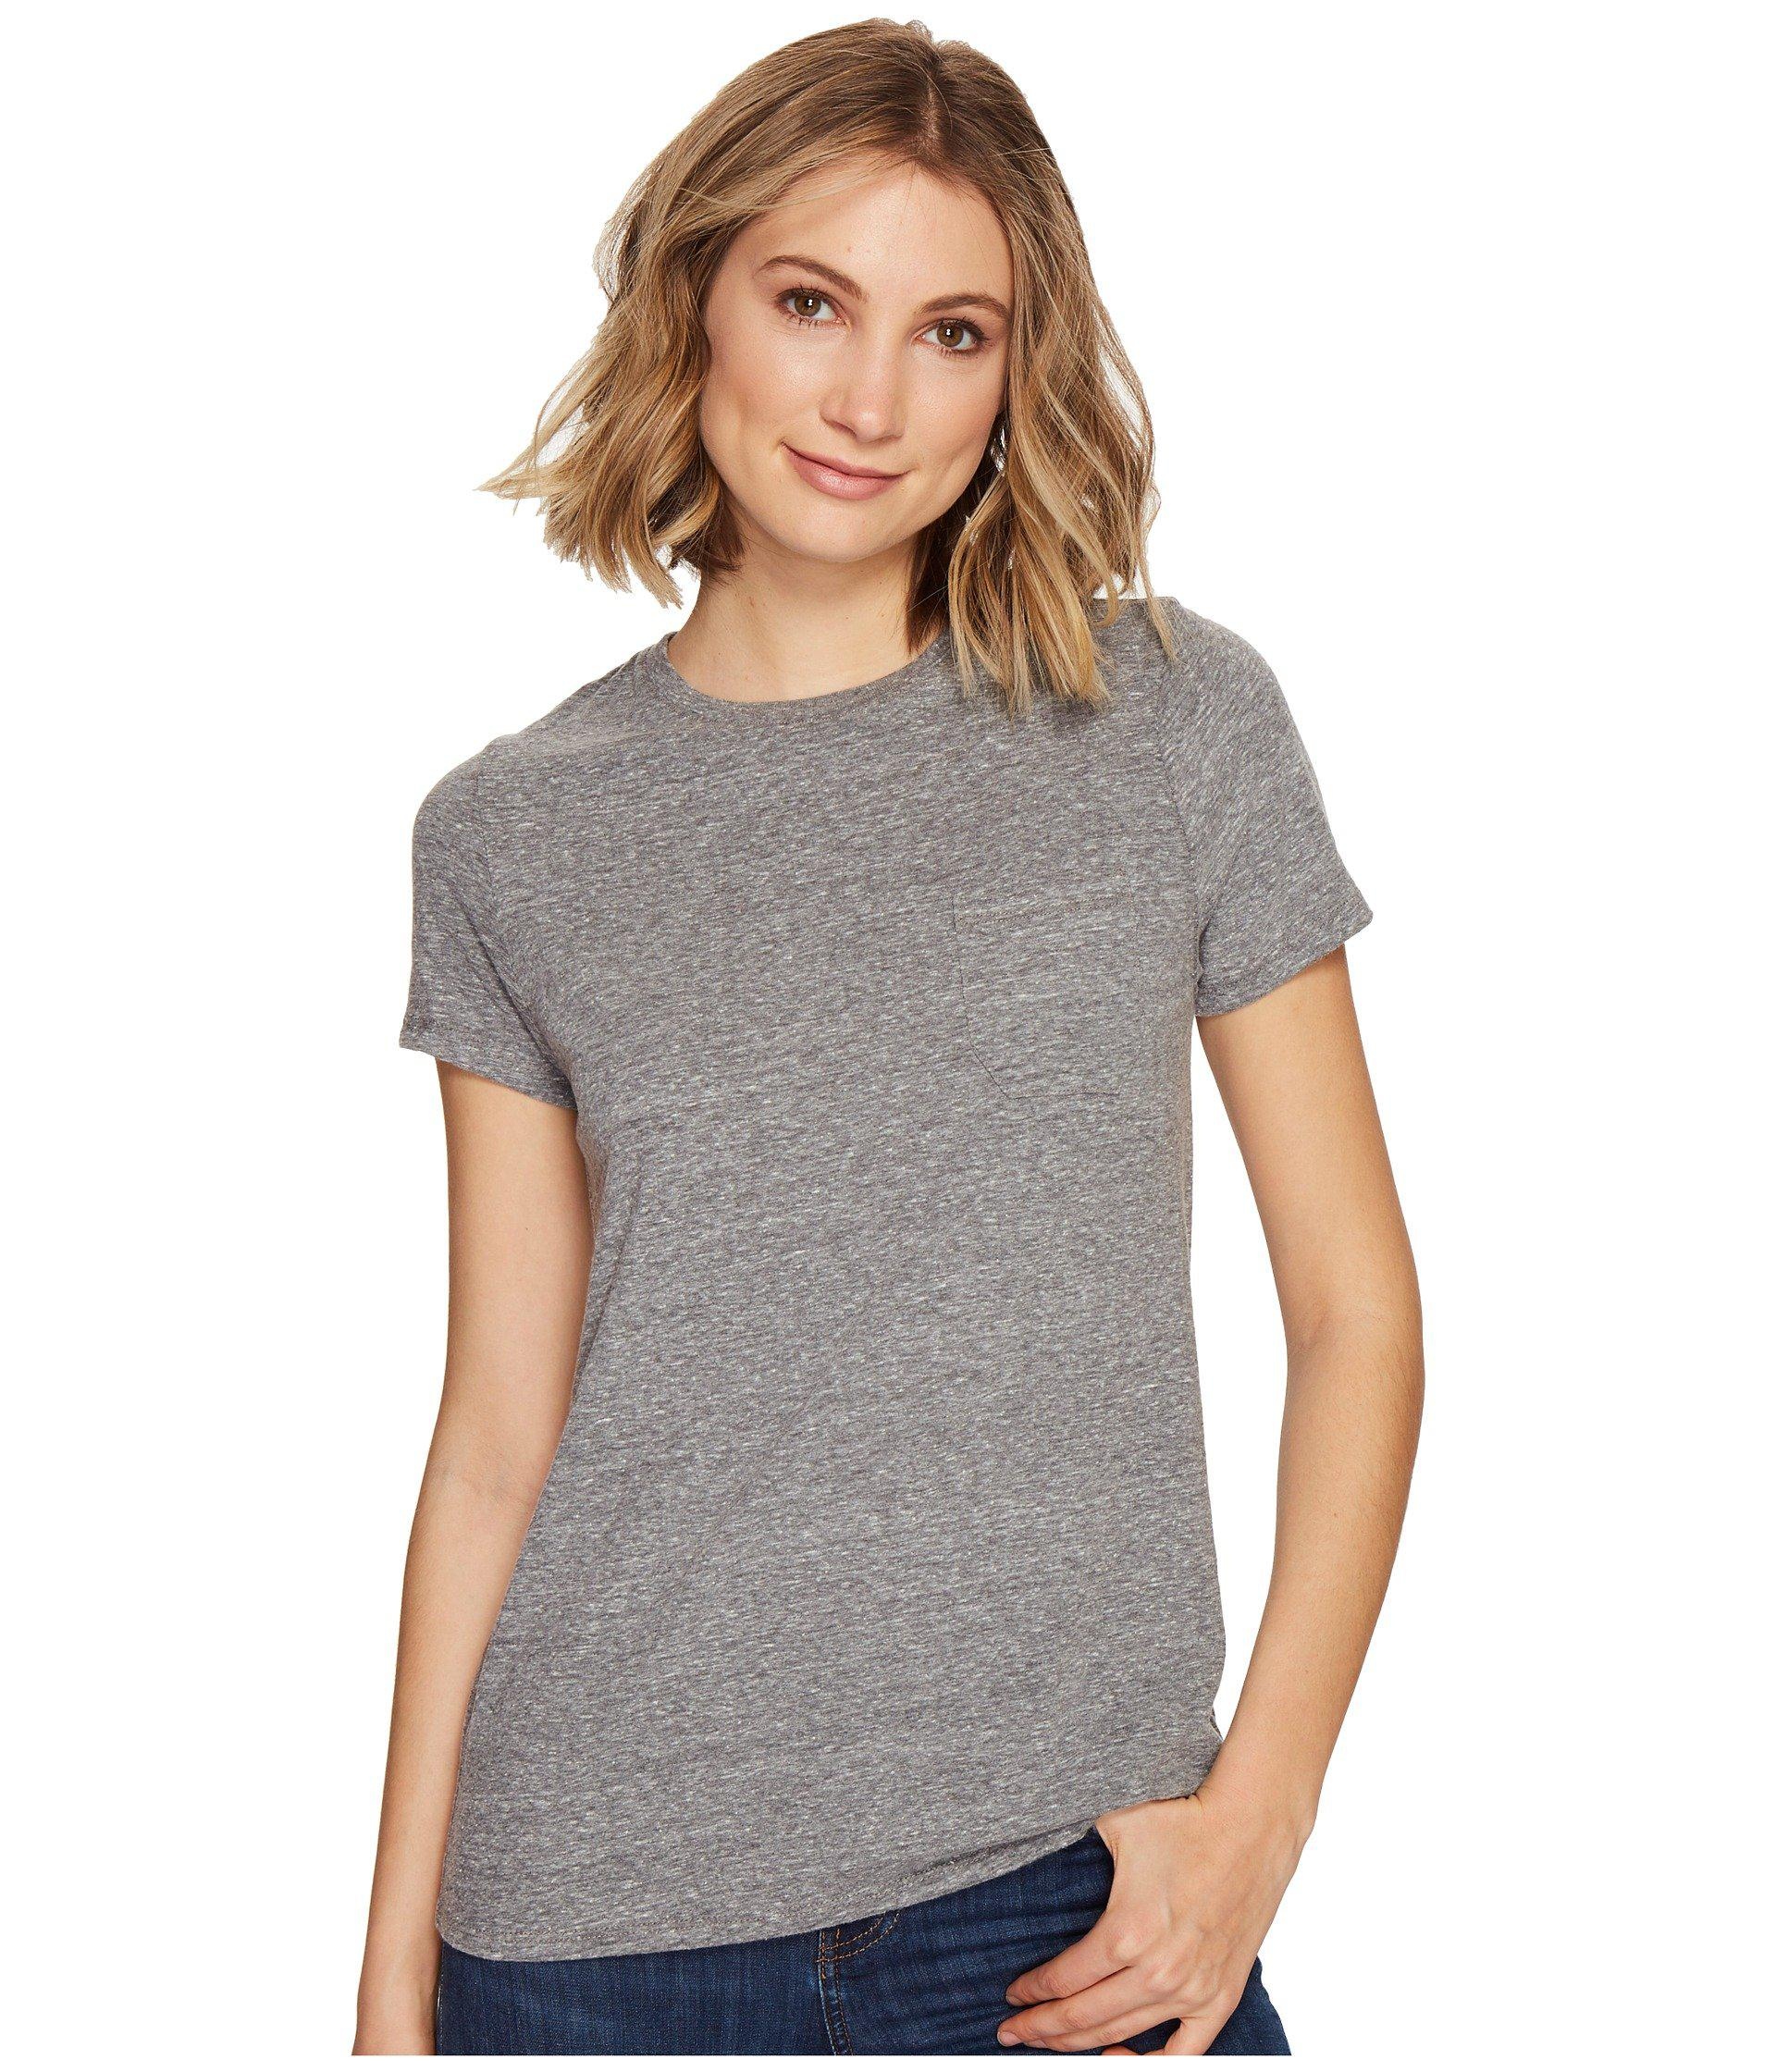 ce103bccf94 Lyst - Richer Poorer Crew Pocket Tee (green) Women s T Shirt in Gray